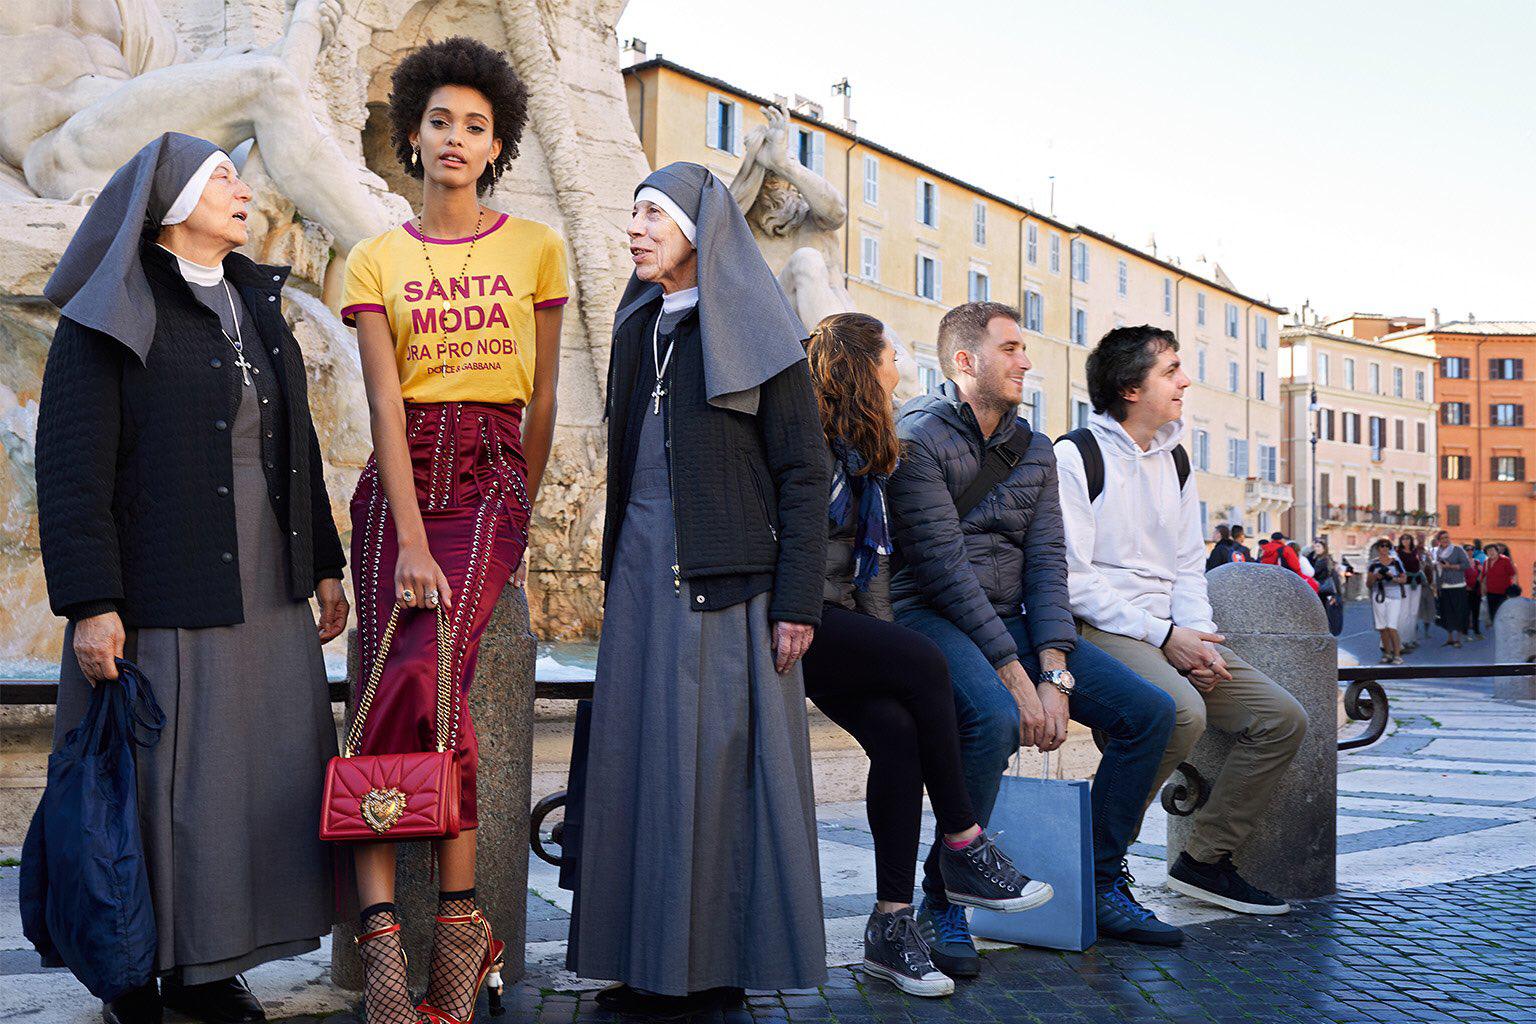 A estética religiosa está sendo ressignificada, adaptada aos novos contextos e os novos contornos que a fé vai ganhando na pós-modernidade.